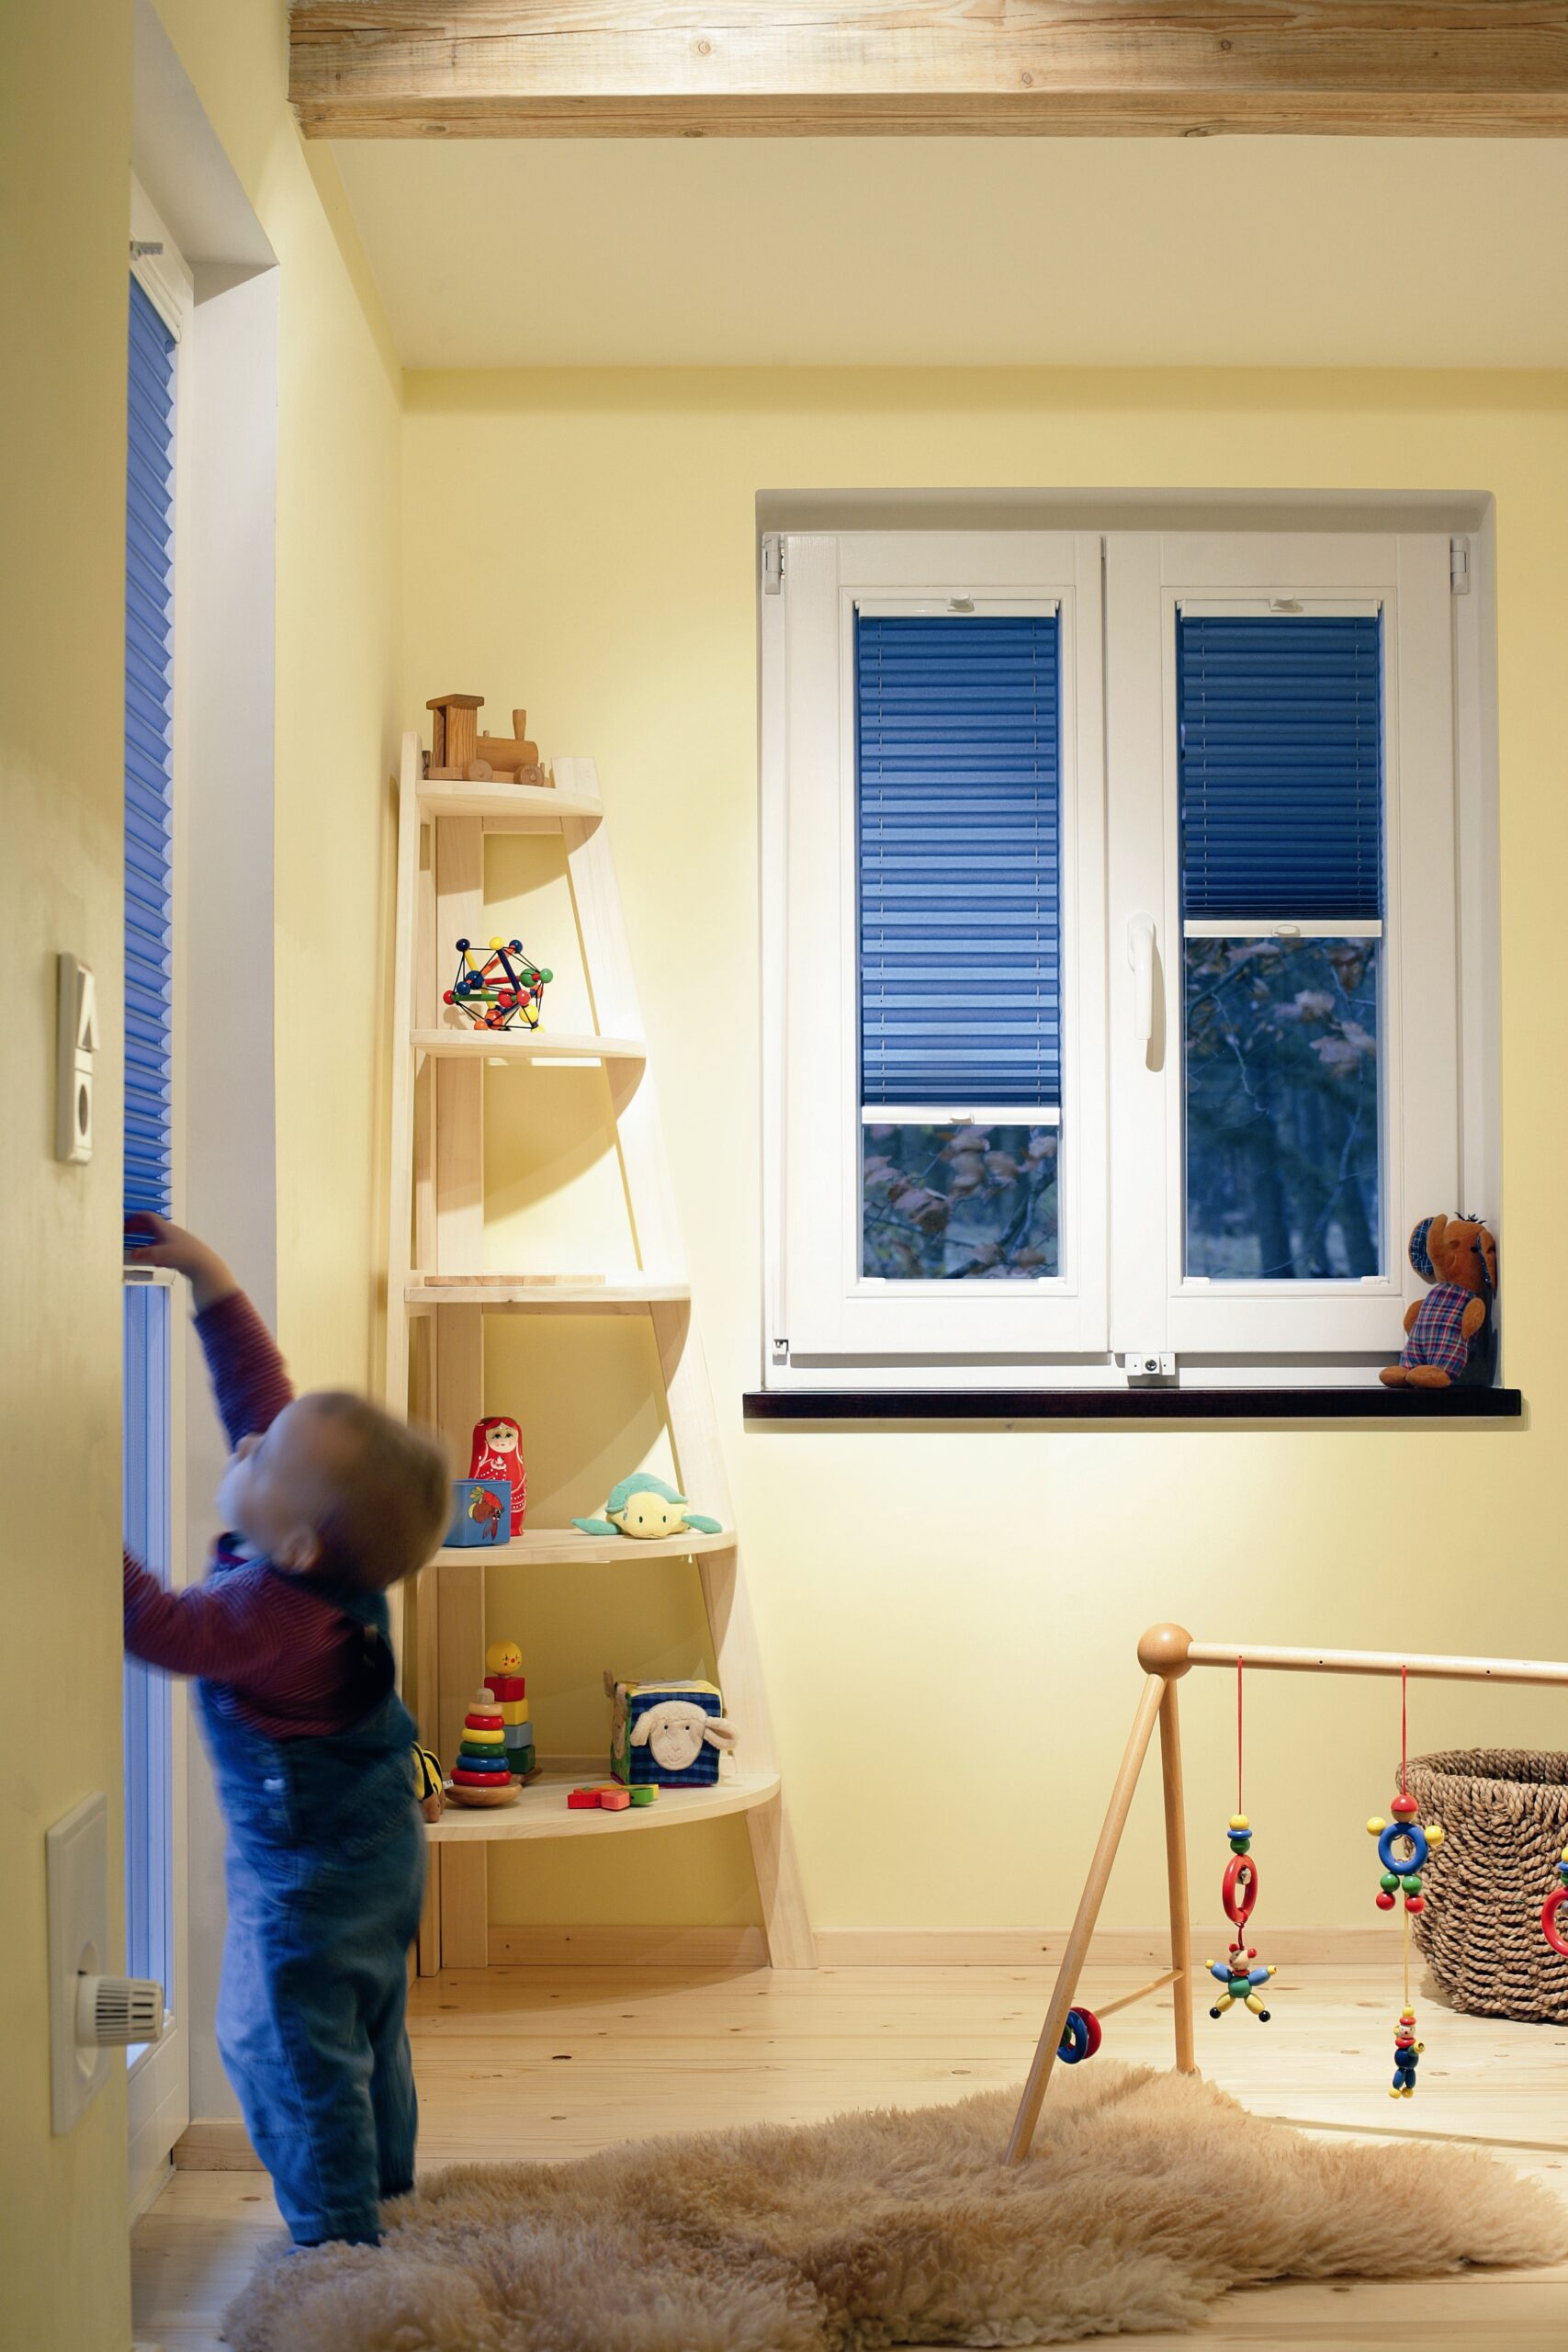 Full Size of Bildergalerie Plissee Wabenplissee Rollomeisterde Regale Kinderzimmer Regal Weiß Fenster Sofa Kinderzimmer Plissee Kinderzimmer